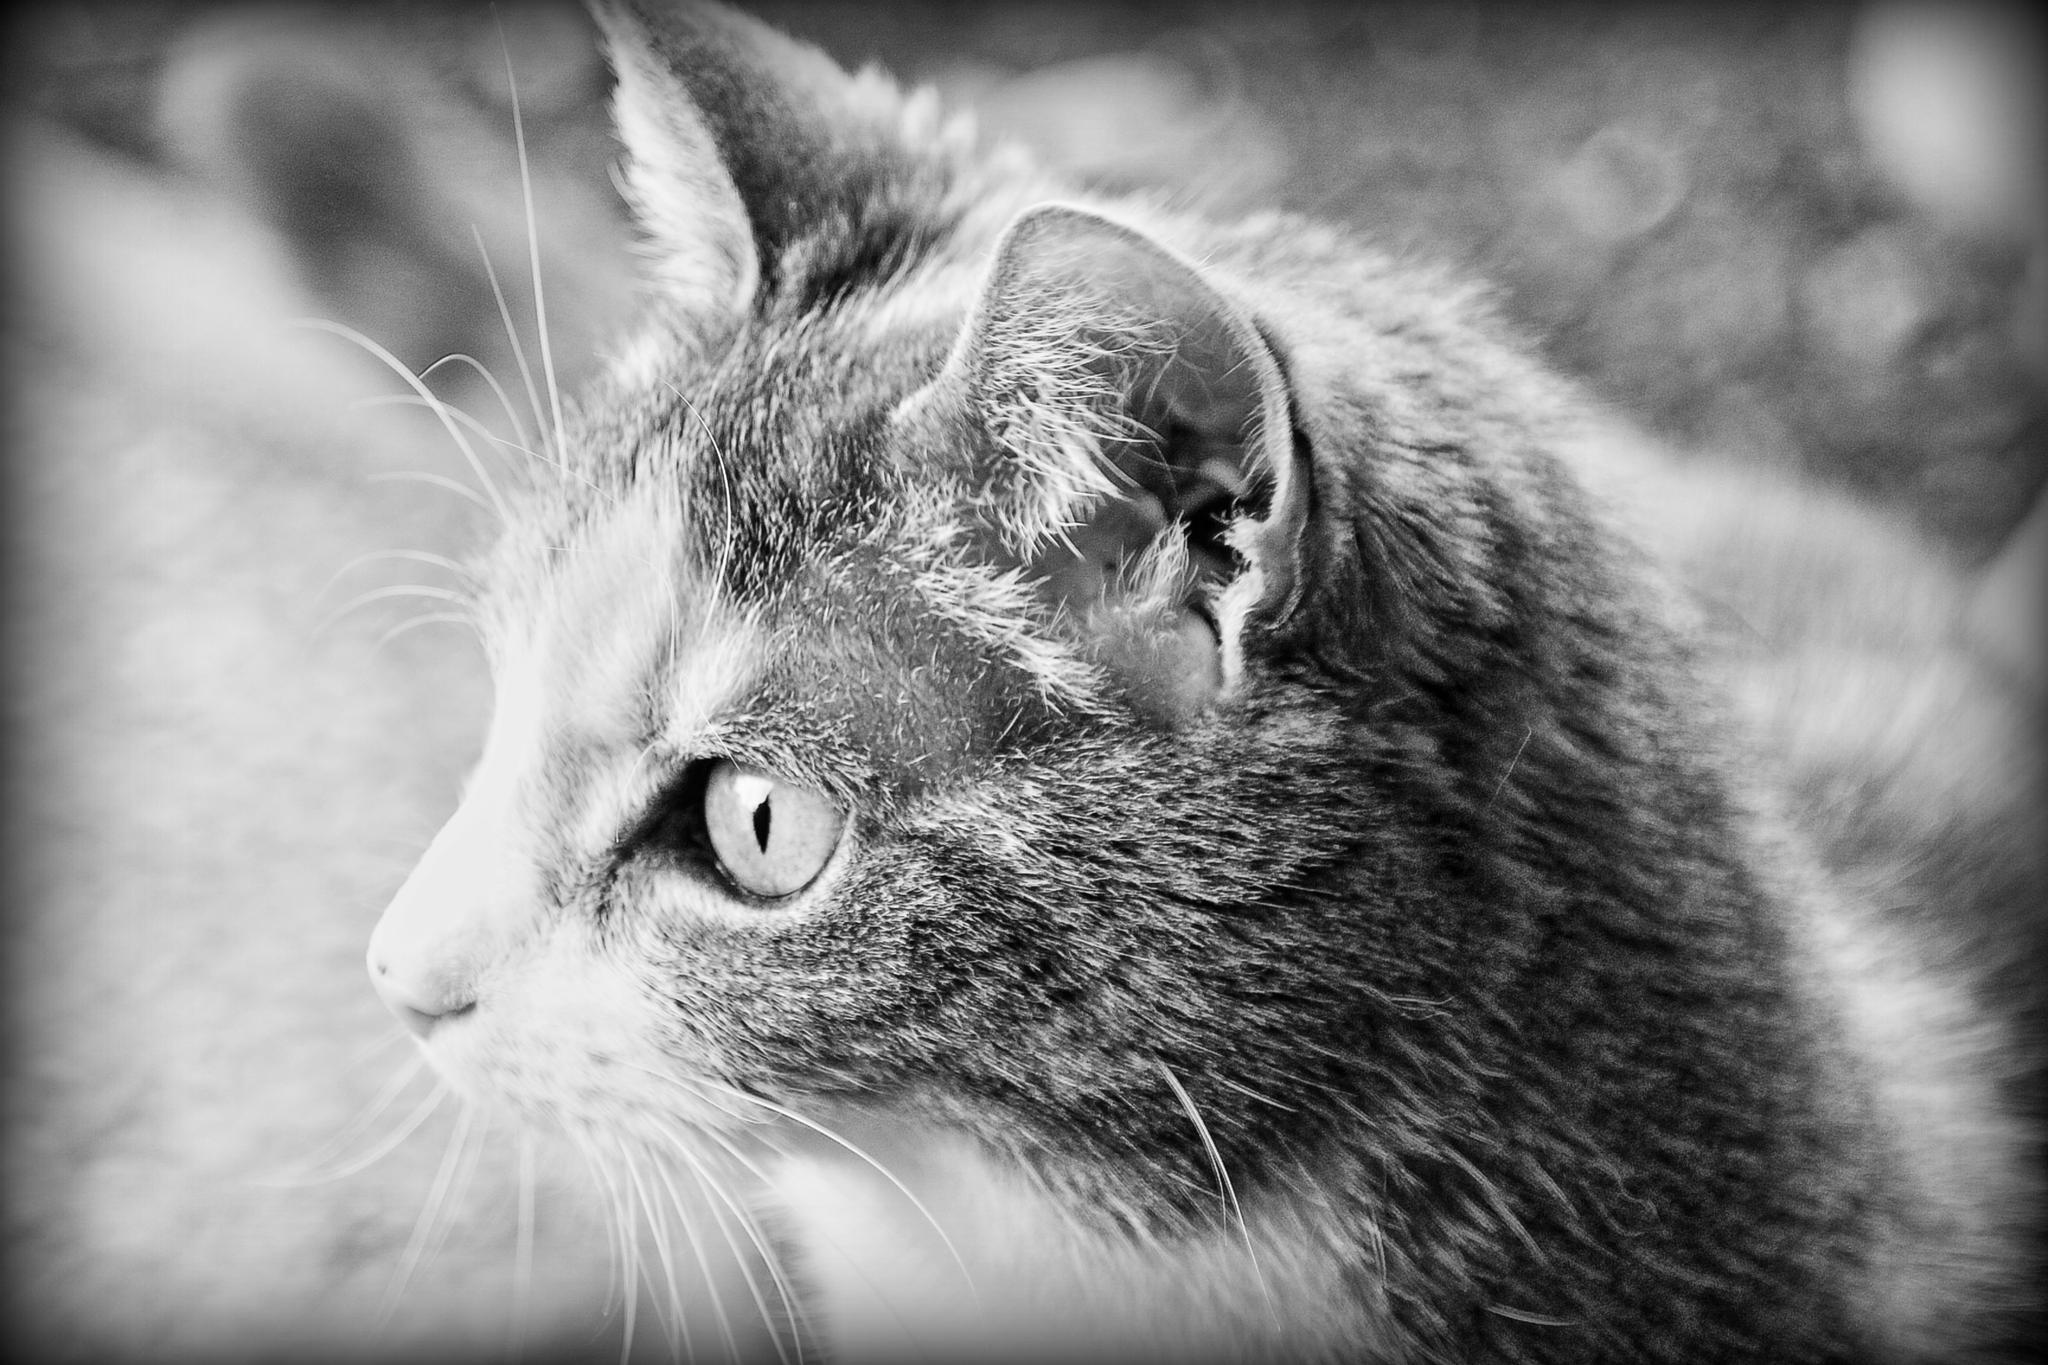 my little cat Twinkel by Evie Tinnevelt